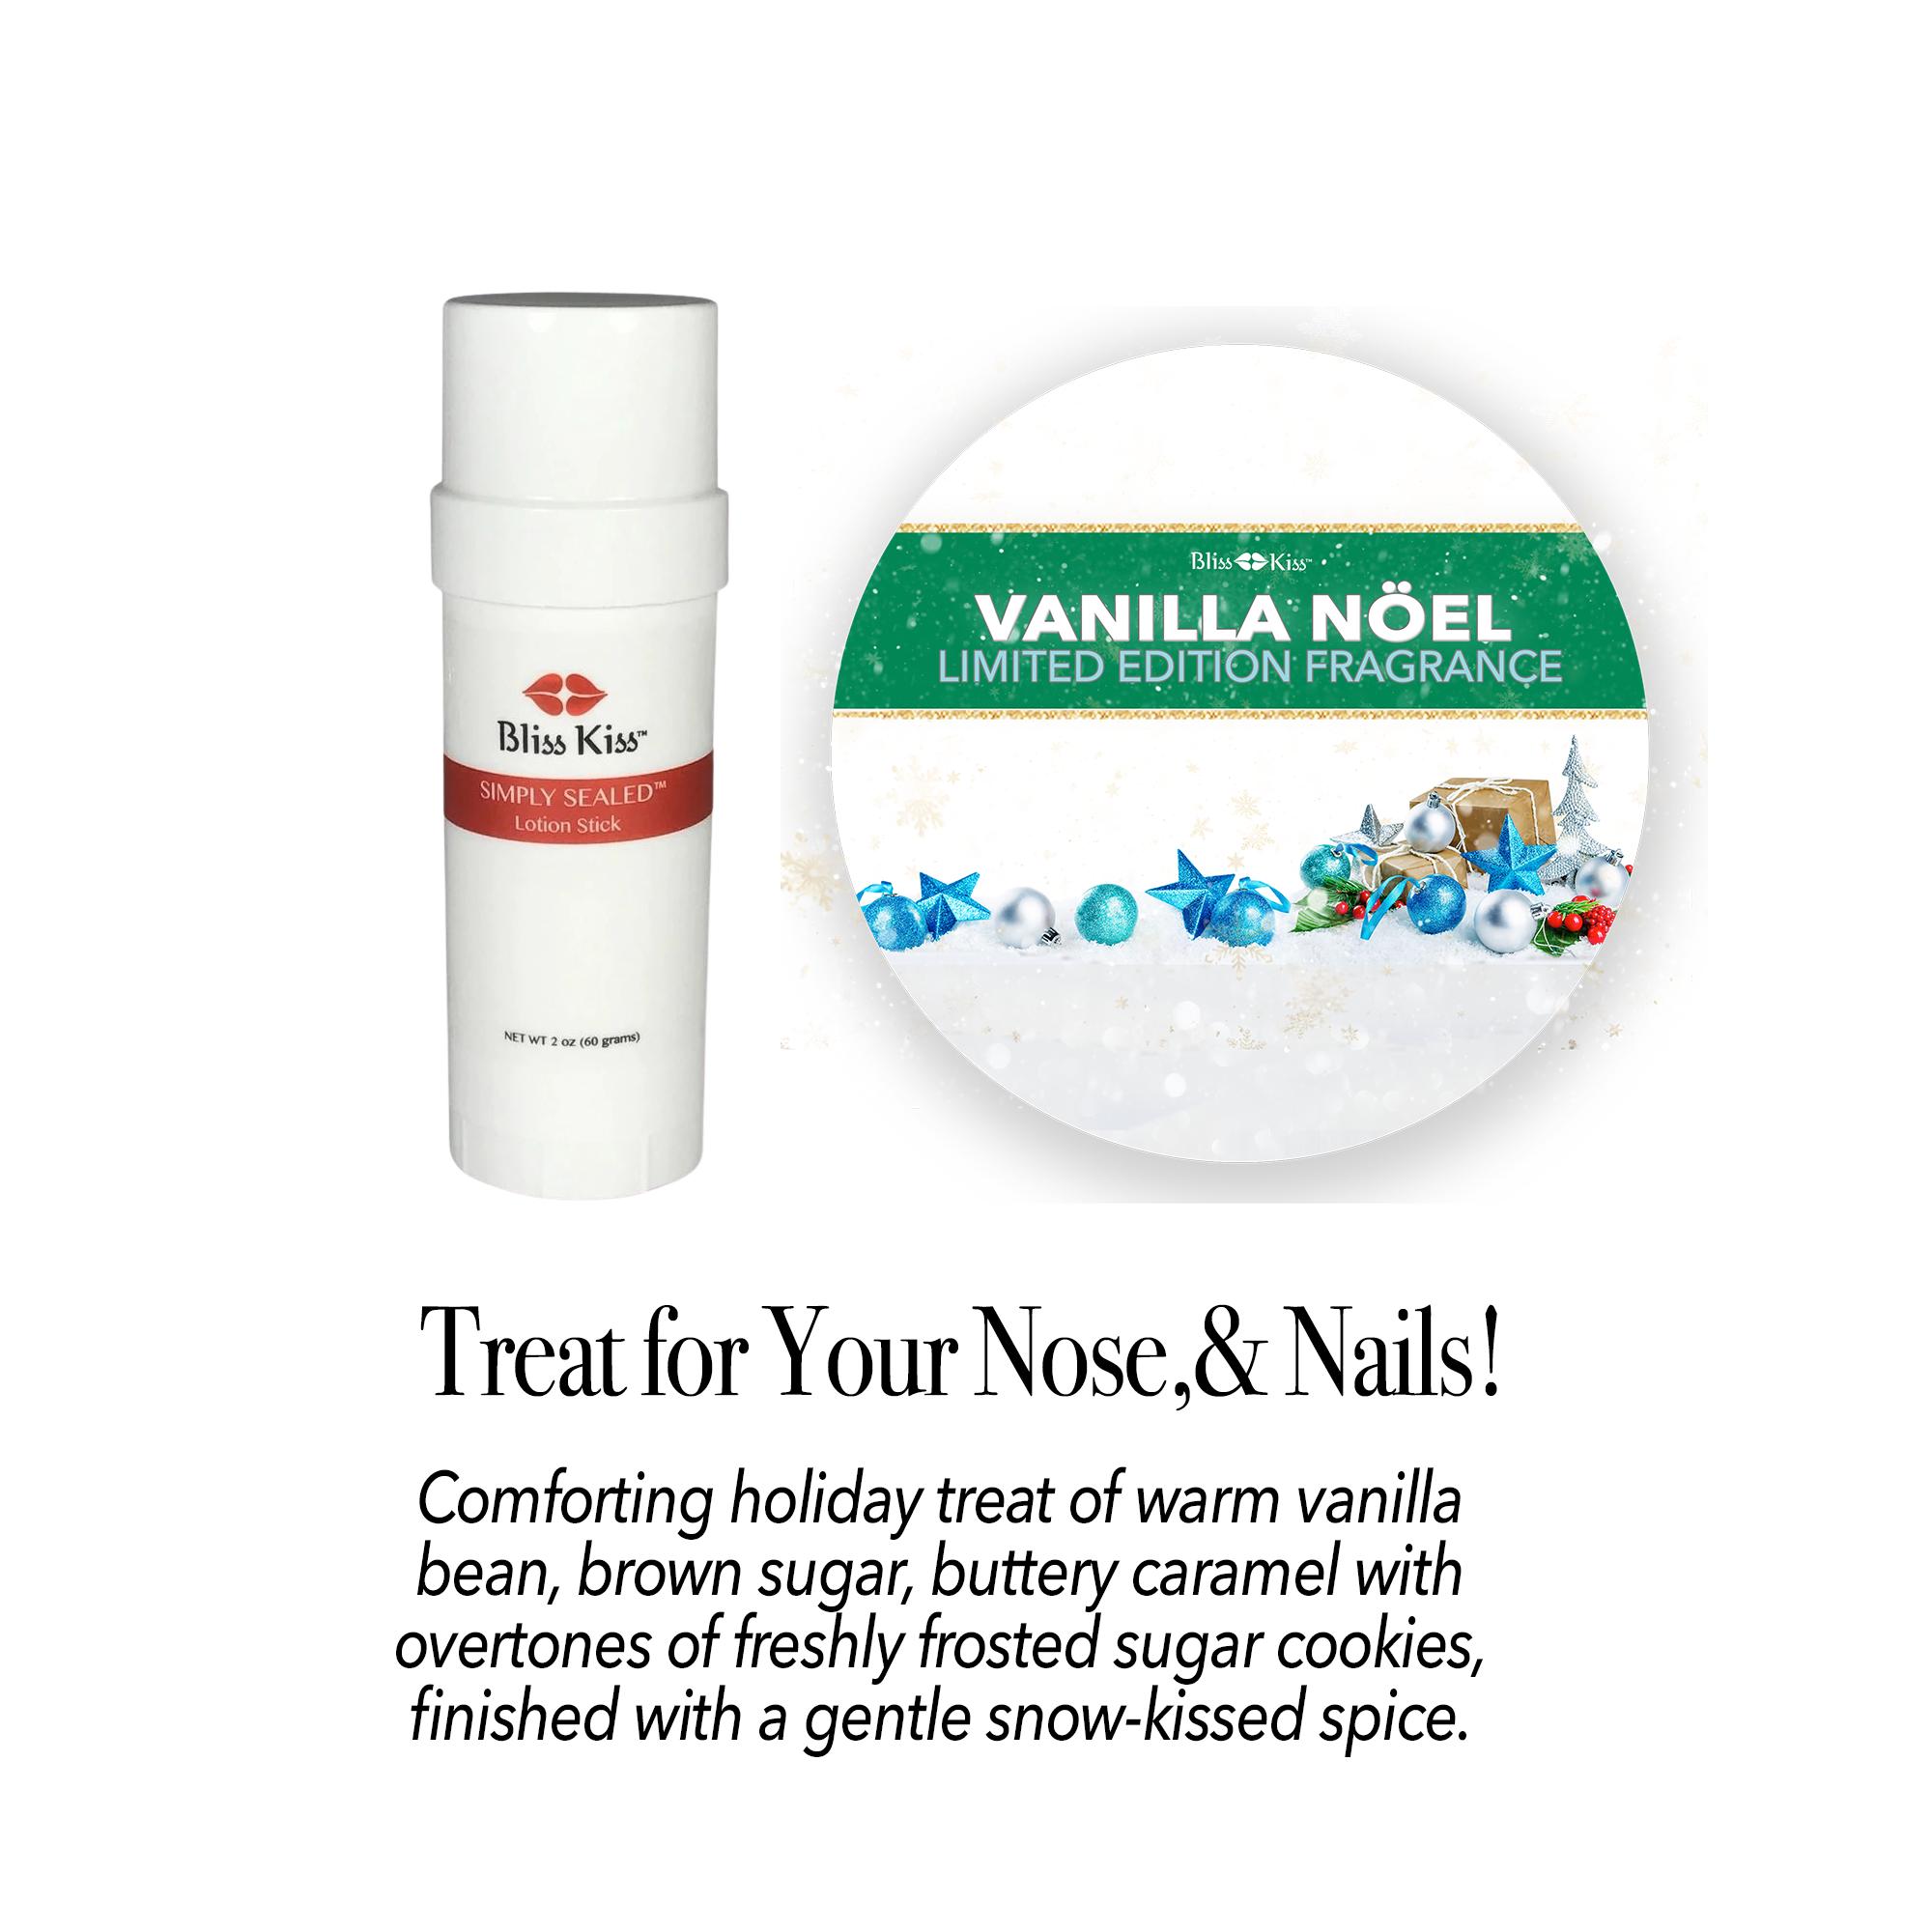 Vanilla Noel Simply Sealed Lotion Stick